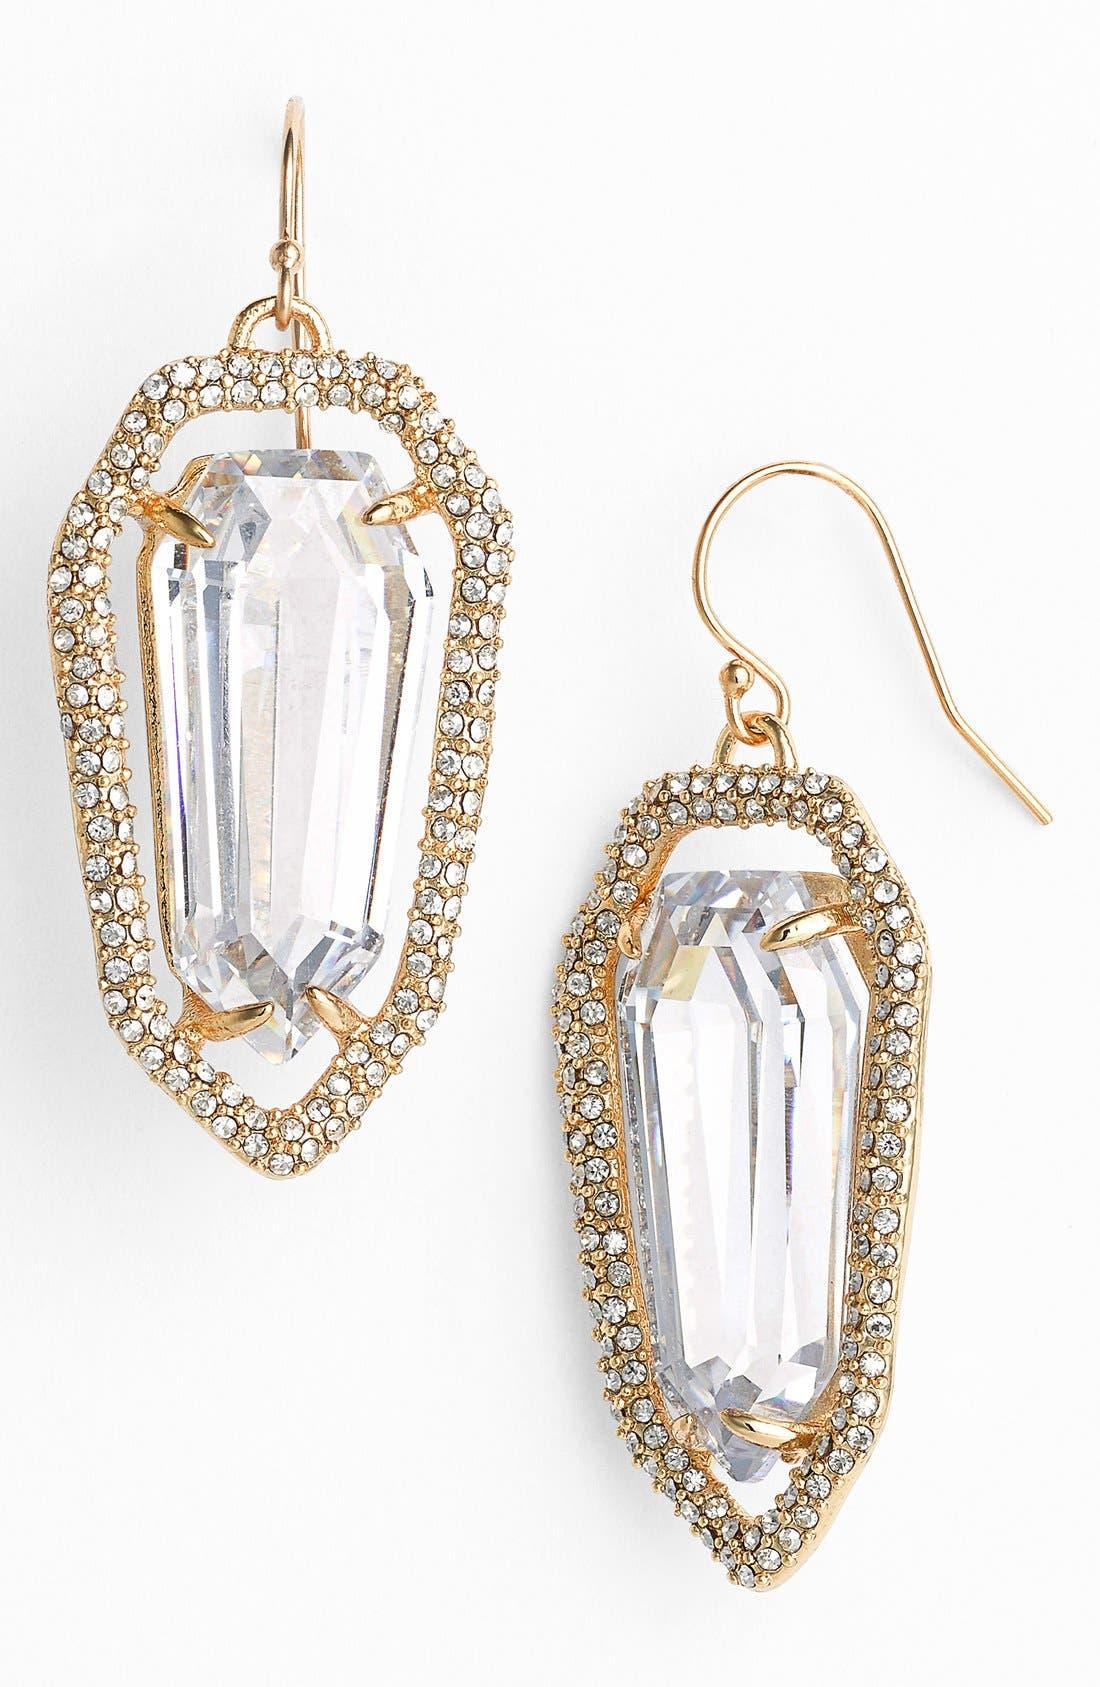 Main Image - Alexis Bittar 'Miss Havisham' Crystal Encrusted Shield Earrings